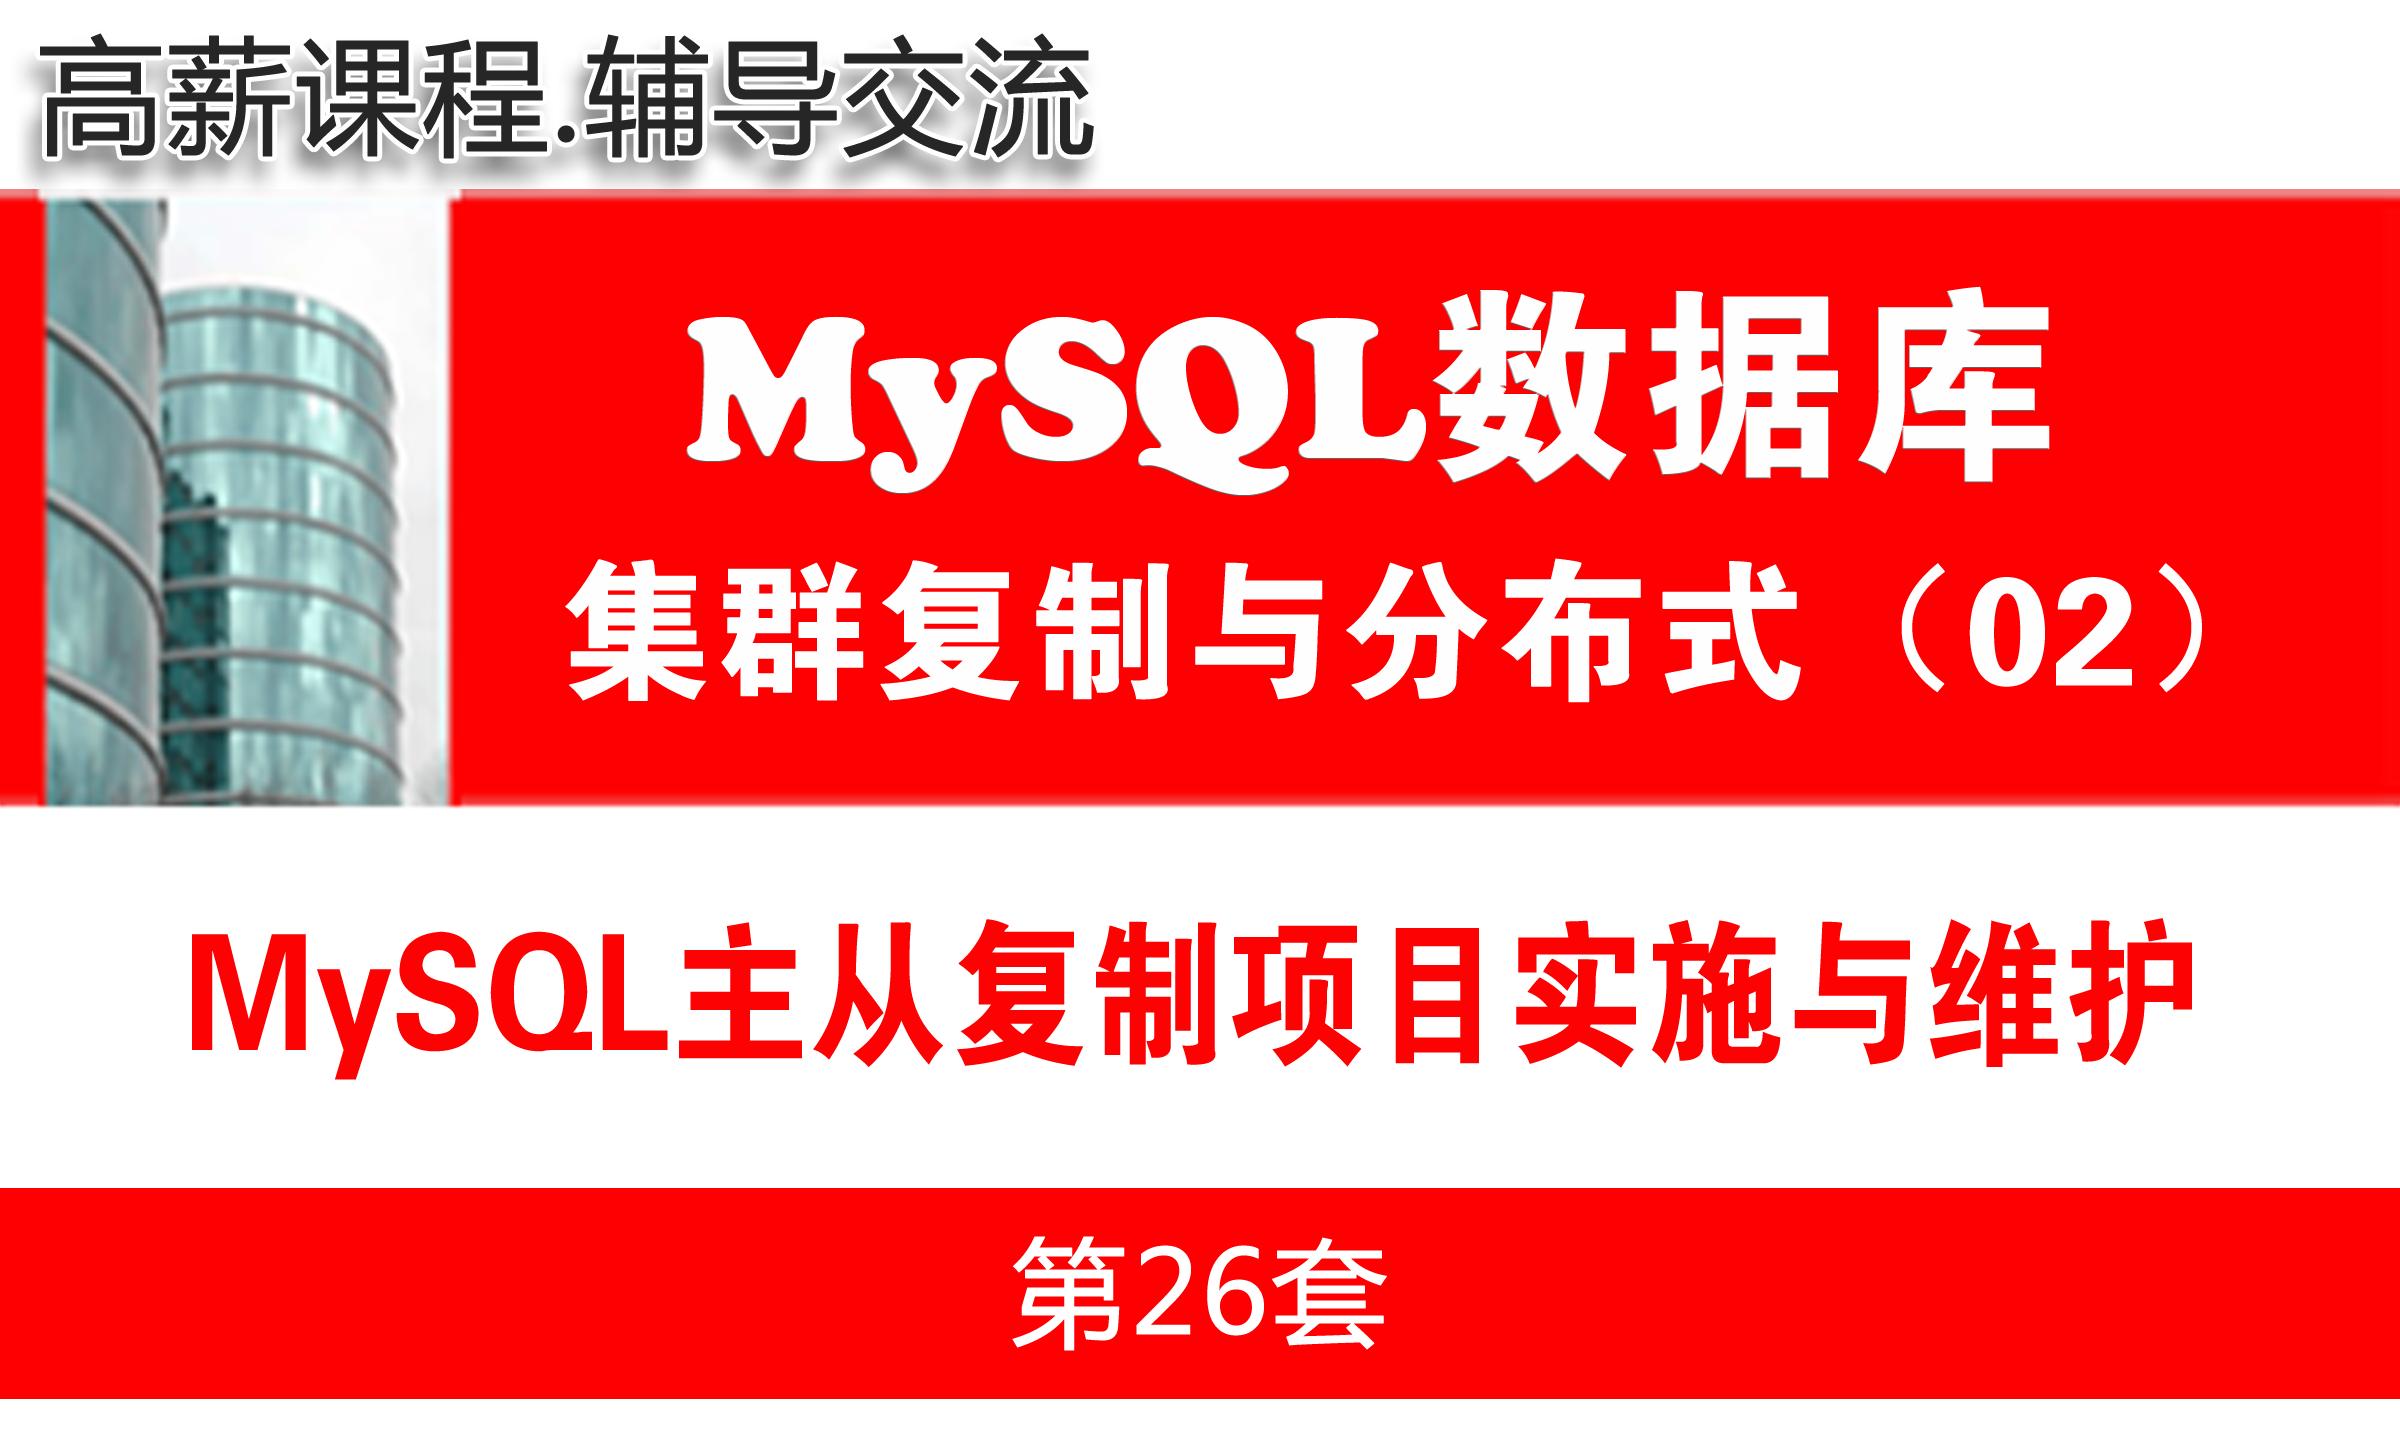 MySQL主从复制项目实施与维护01(MR)_MySQL高可用复制与分布式集群架构02